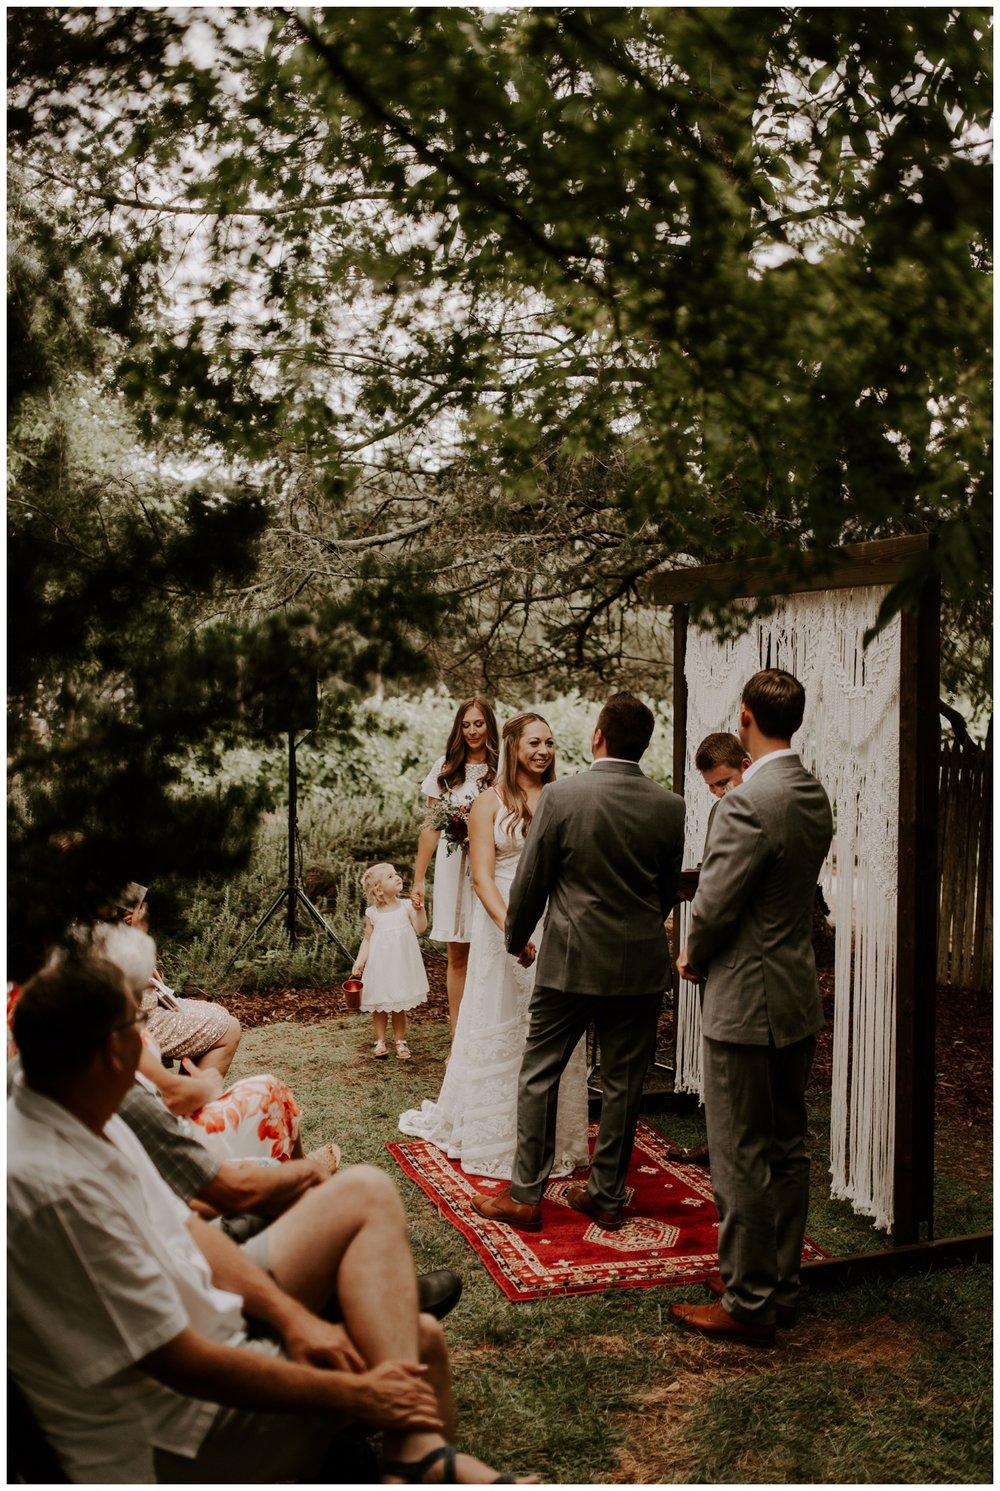 Napa Valley Backyard Wedding and Reception at Elizabeth Spencer Winery | Jessica Heron Images 059.jpg